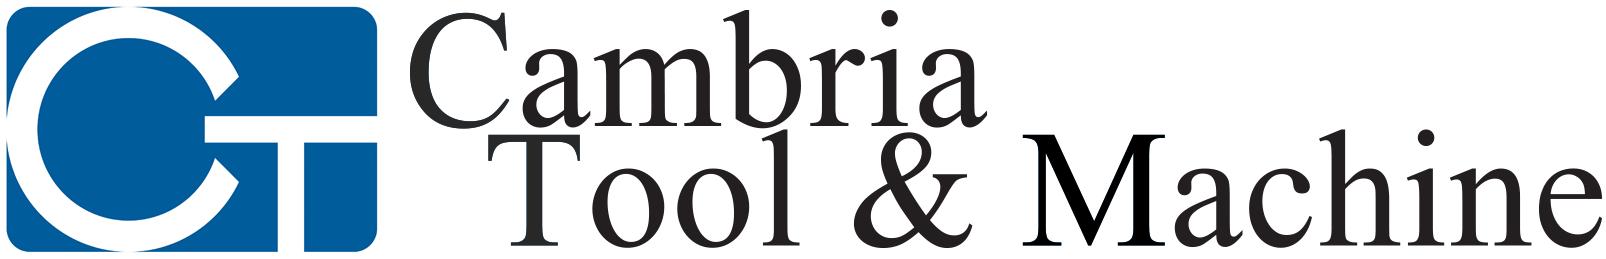 Cambria Tool & Machine